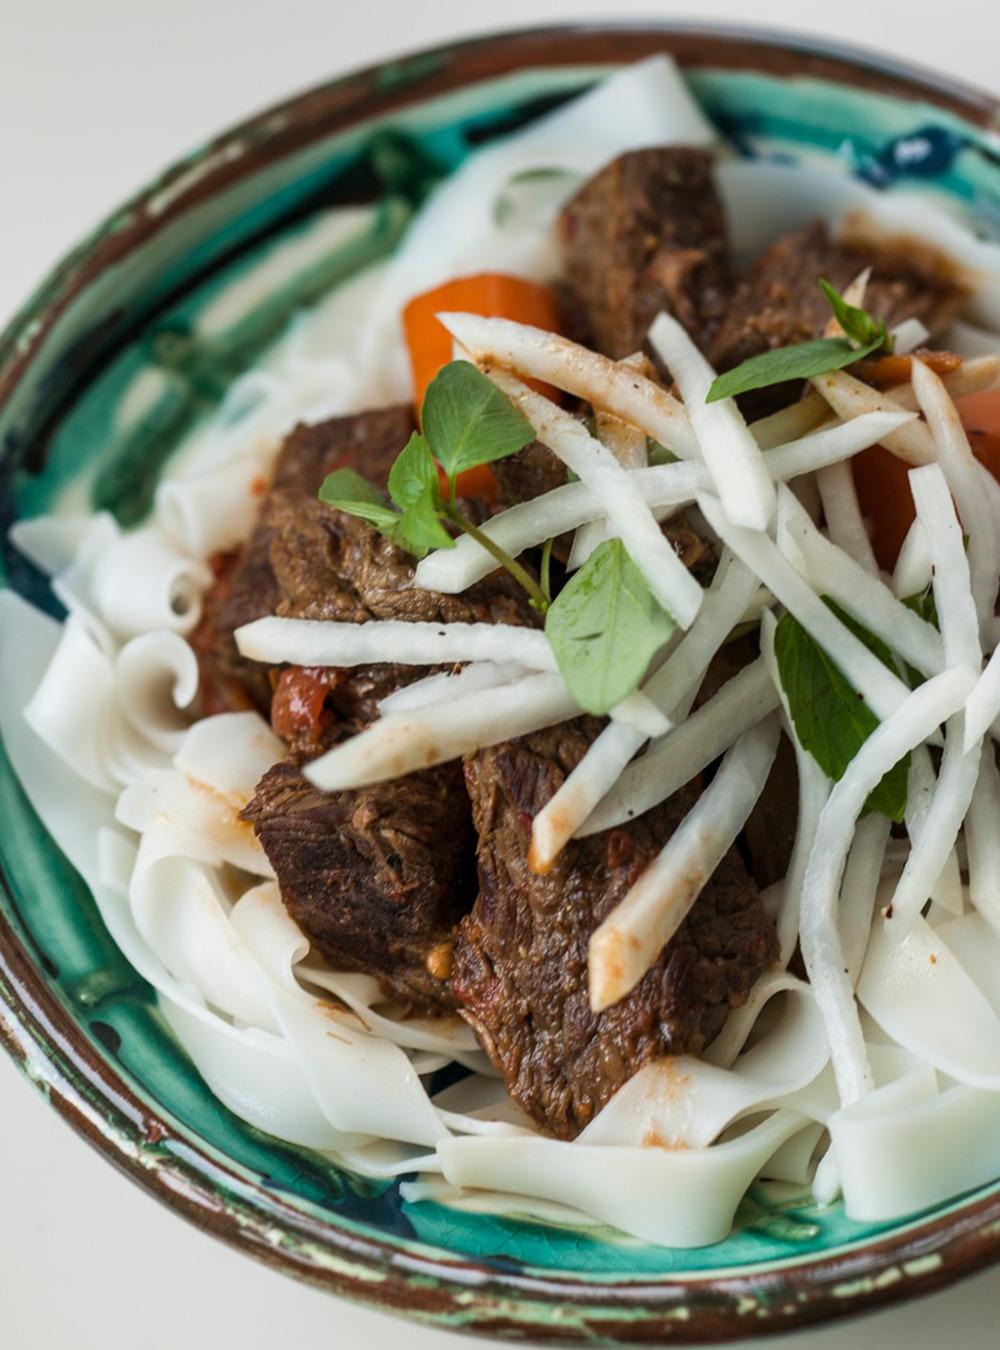 Kim Thuy's Lemongrass Beef Stew with Daikon Salad | Ricardo